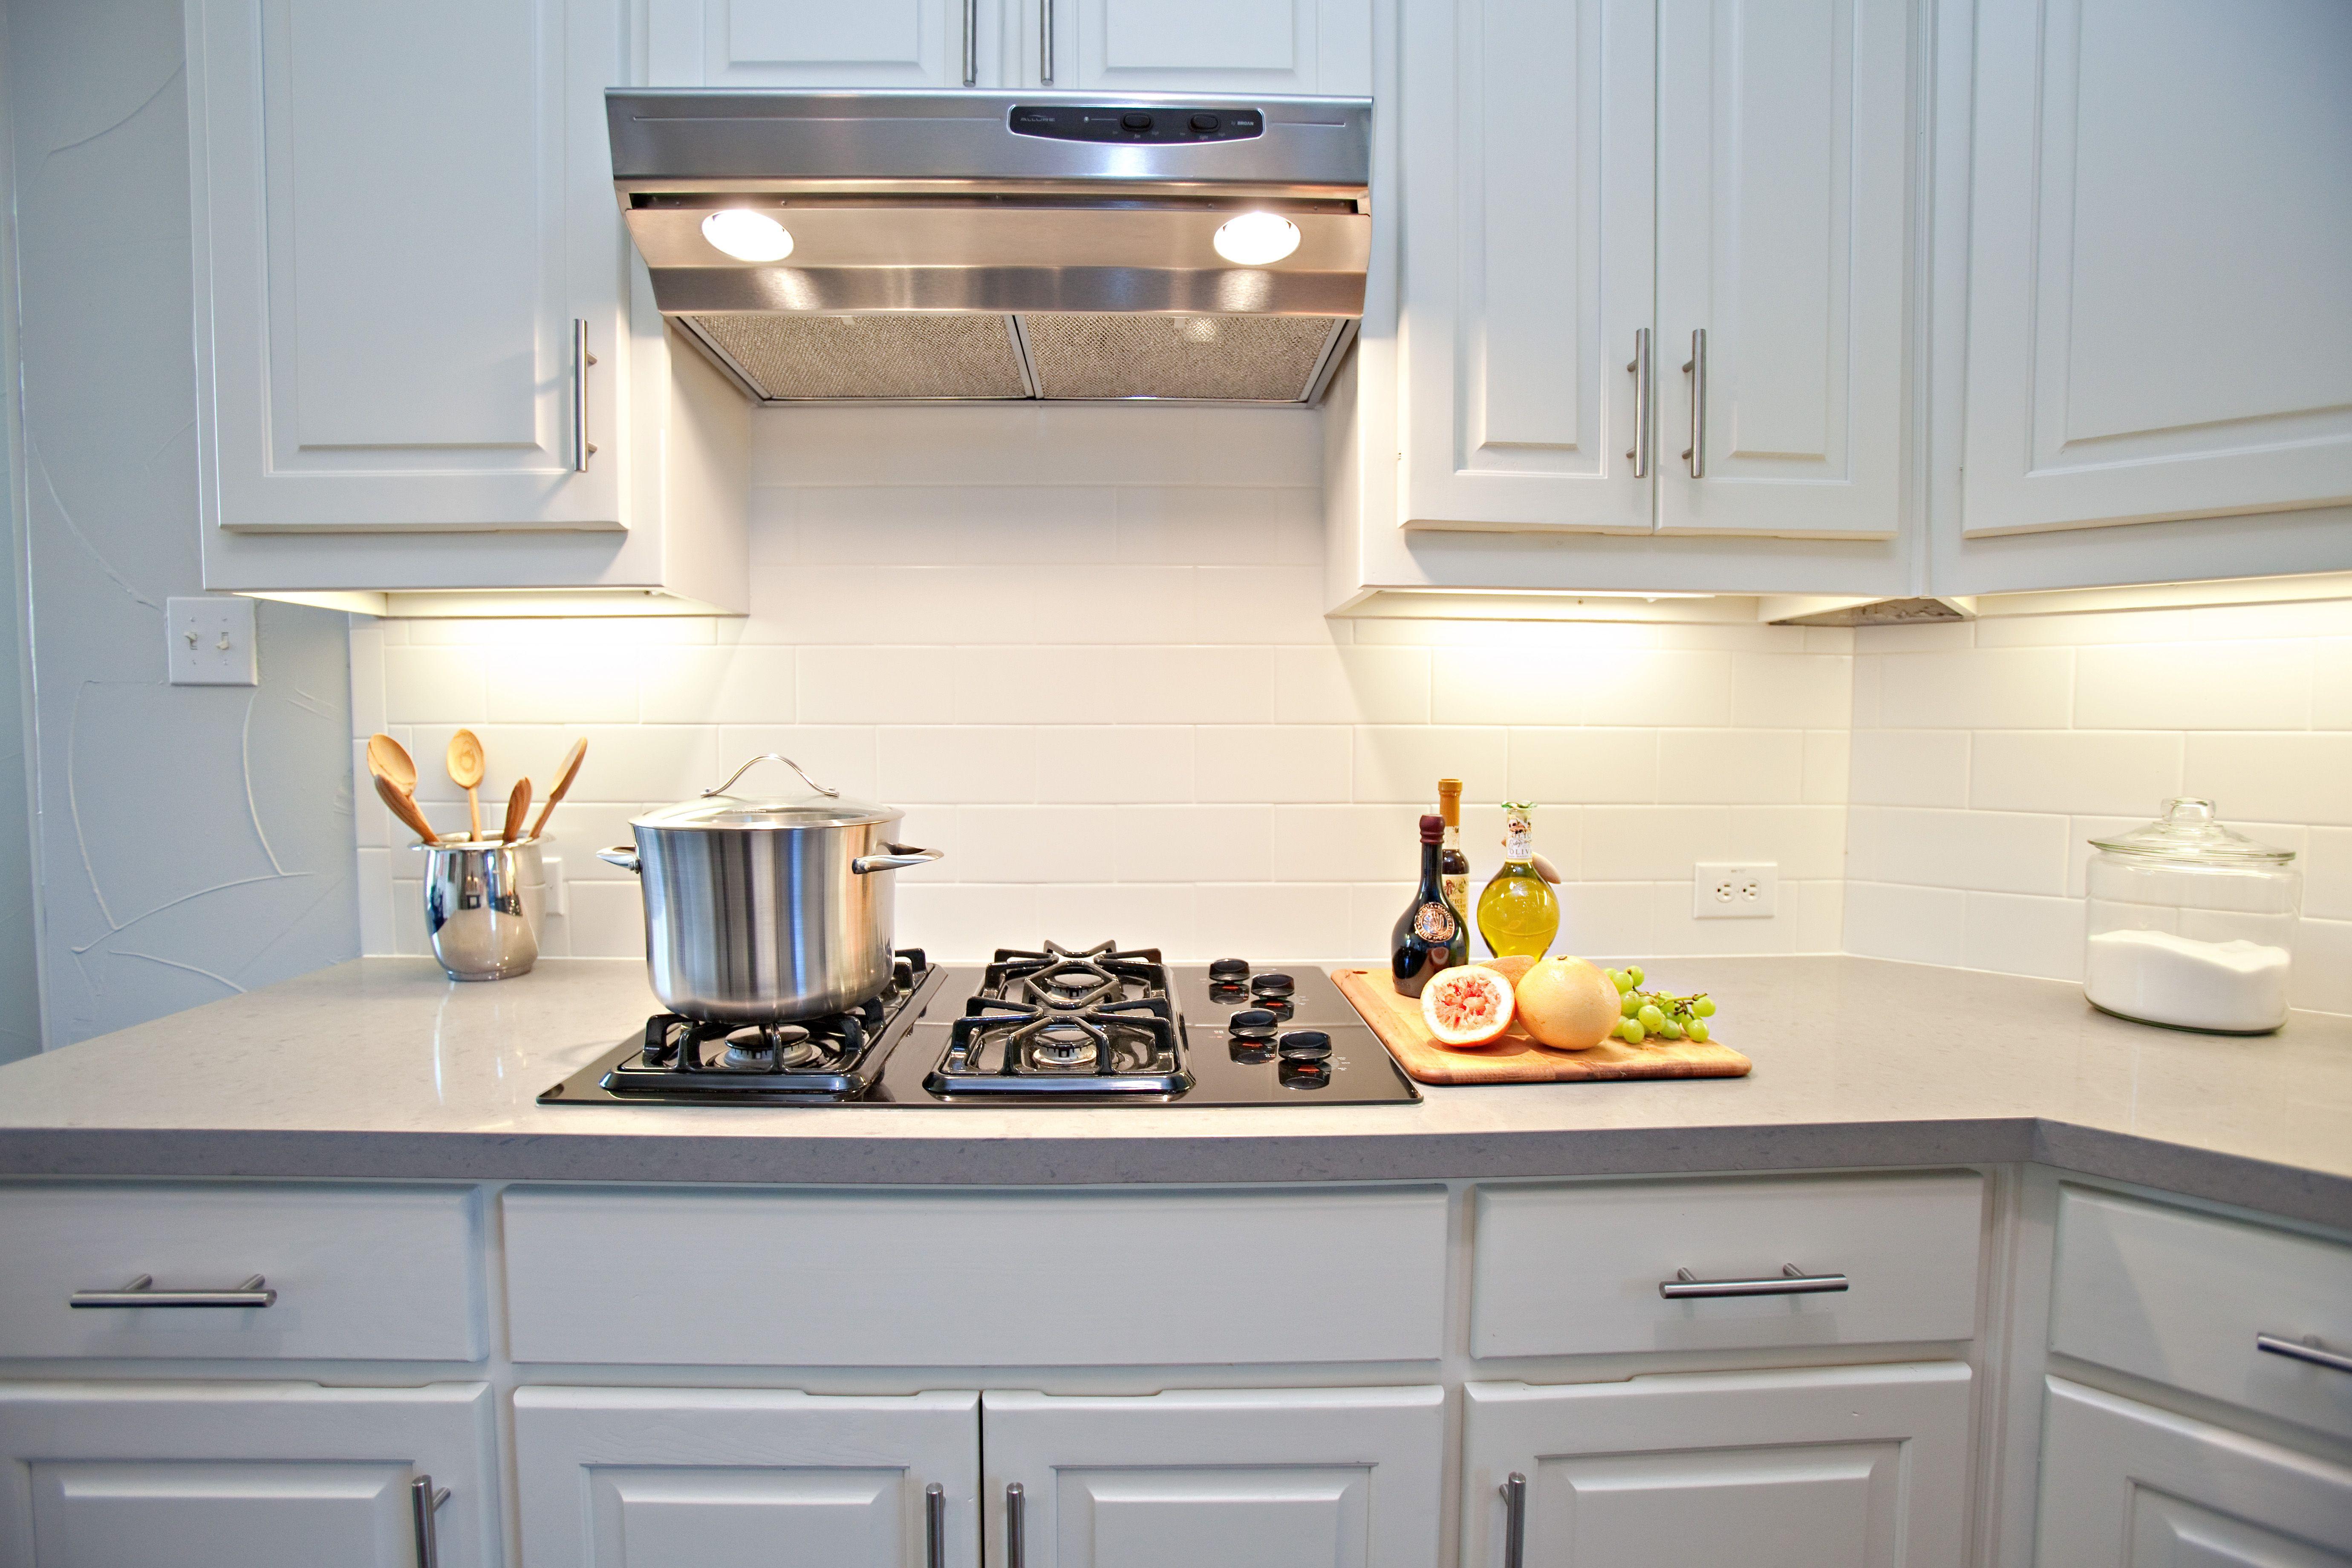 Backsplashes For White Kitchens From Images Of Kitchen Tile Backsplash Kitchen Backsplash Trends White Subway Tiles Kitchen Backsplash Kitchen Tiles Backsplash